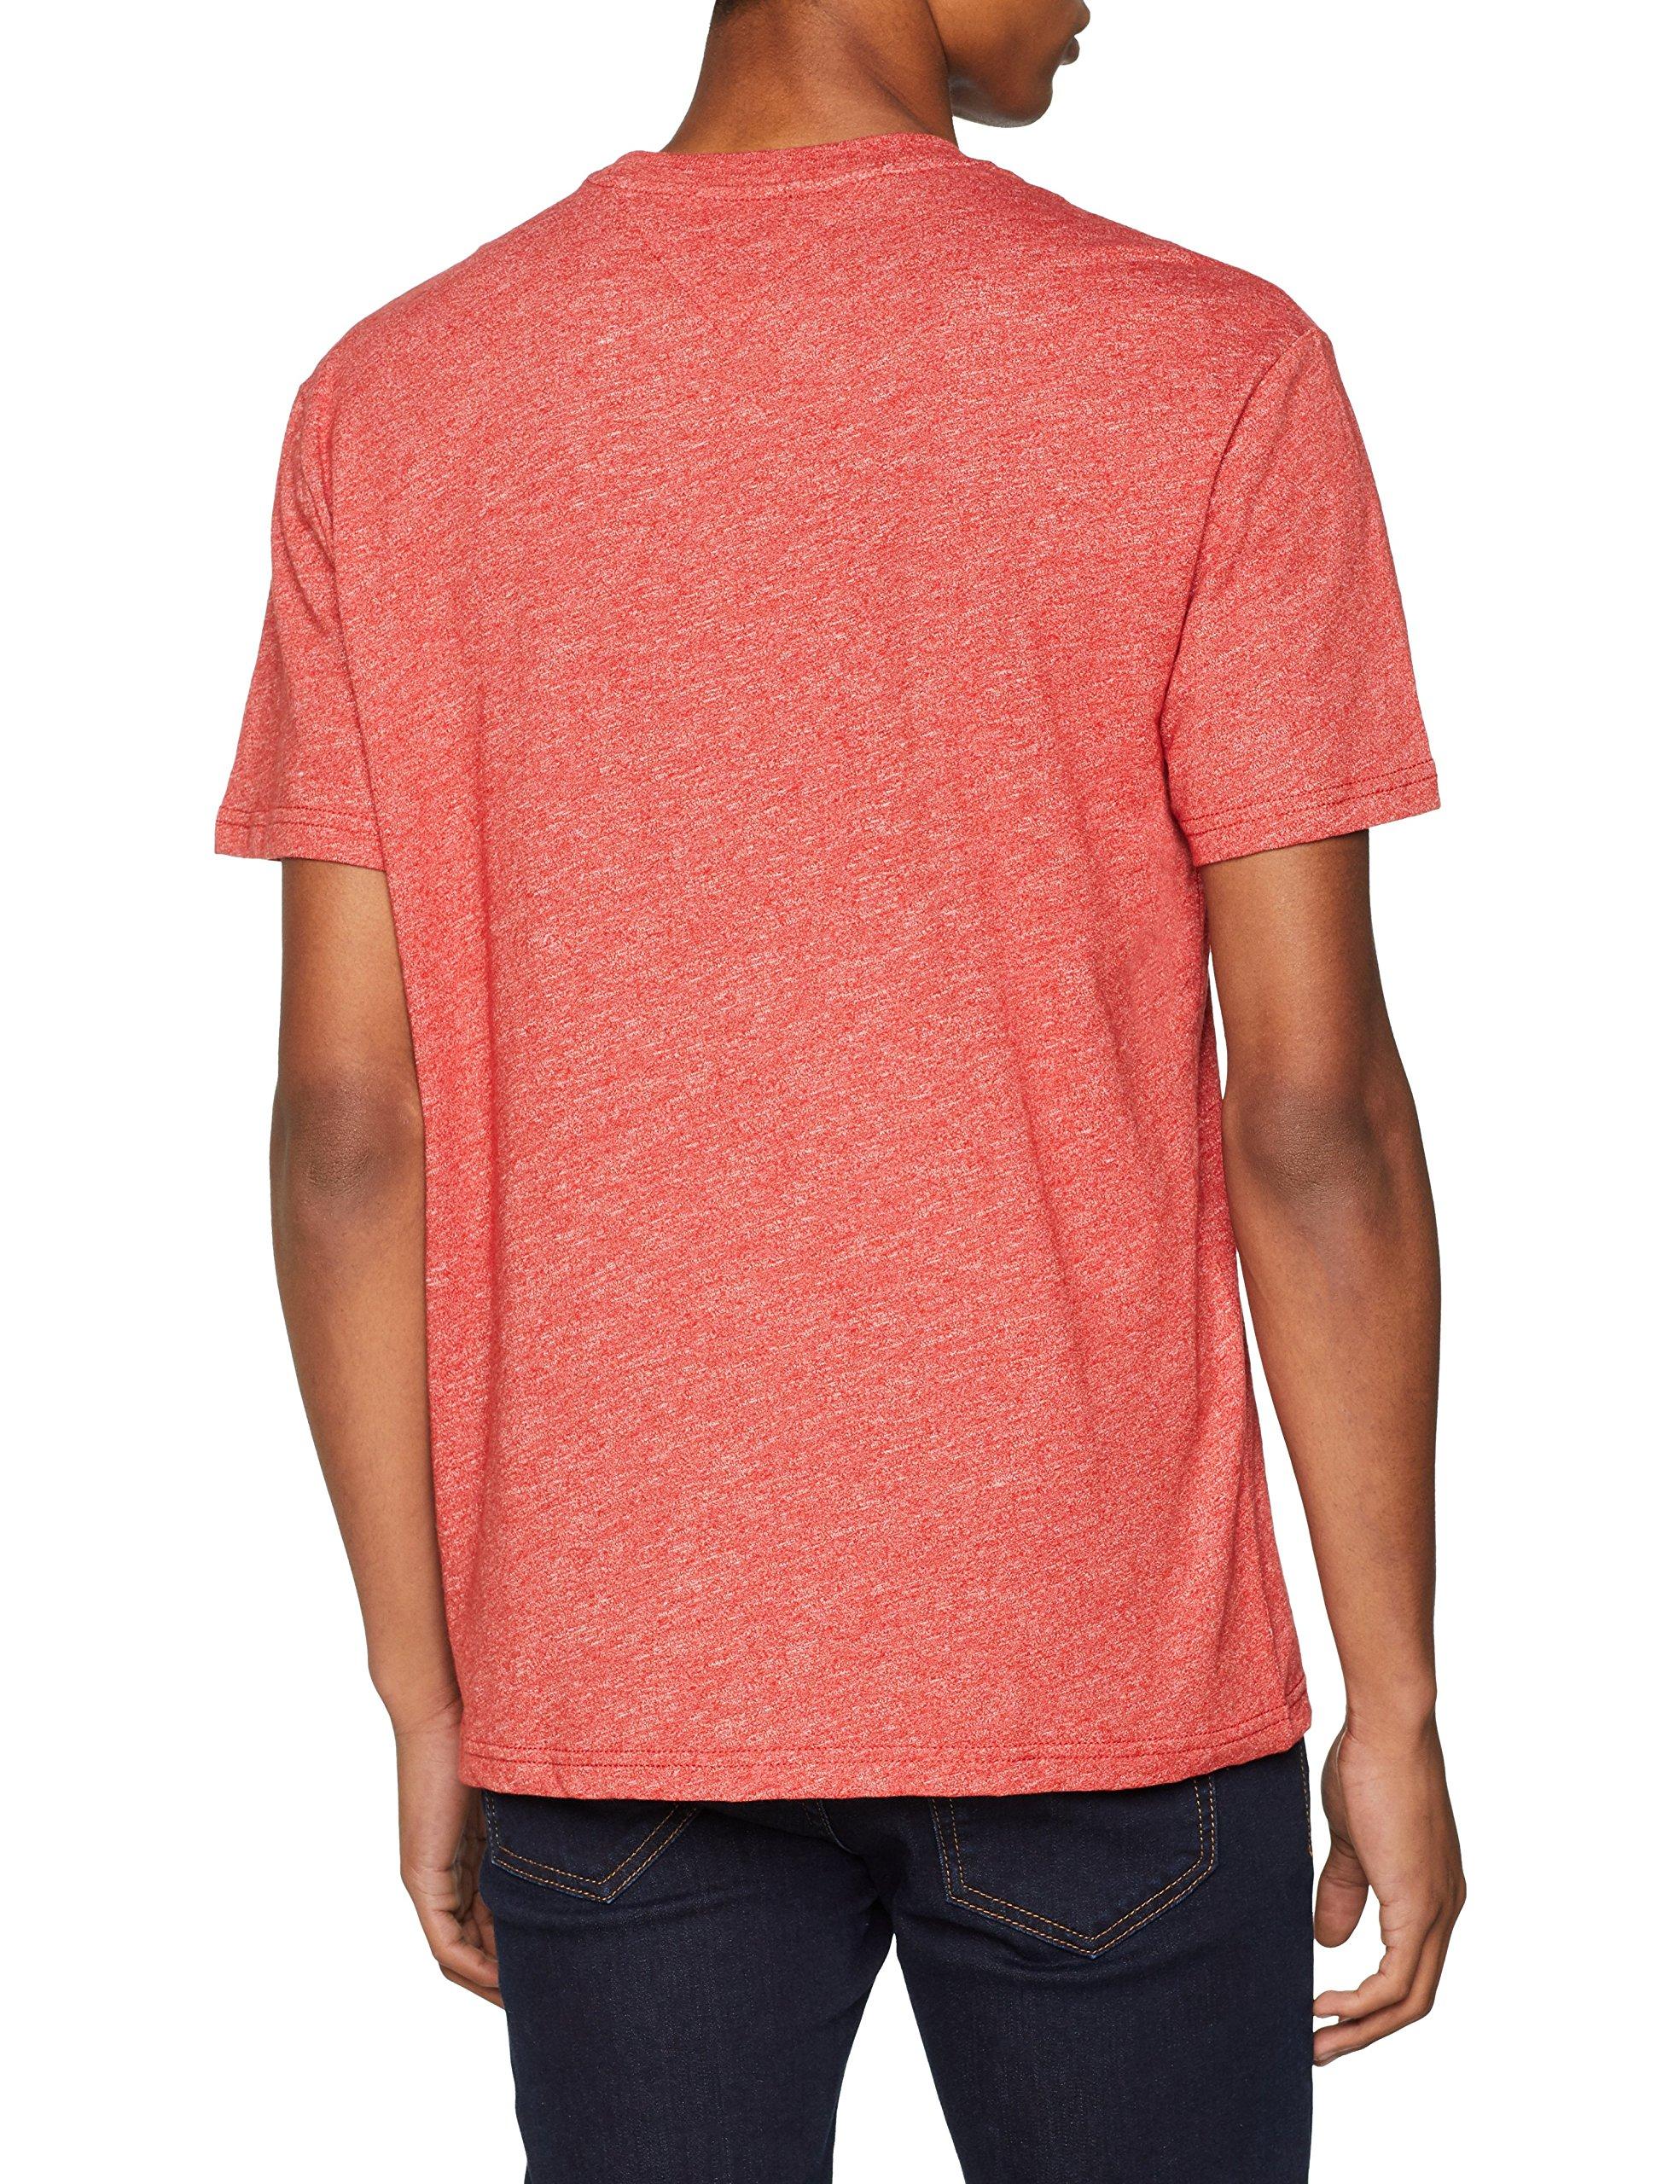 Tommy Hilfiger Collegiate Camiseta para Hombre